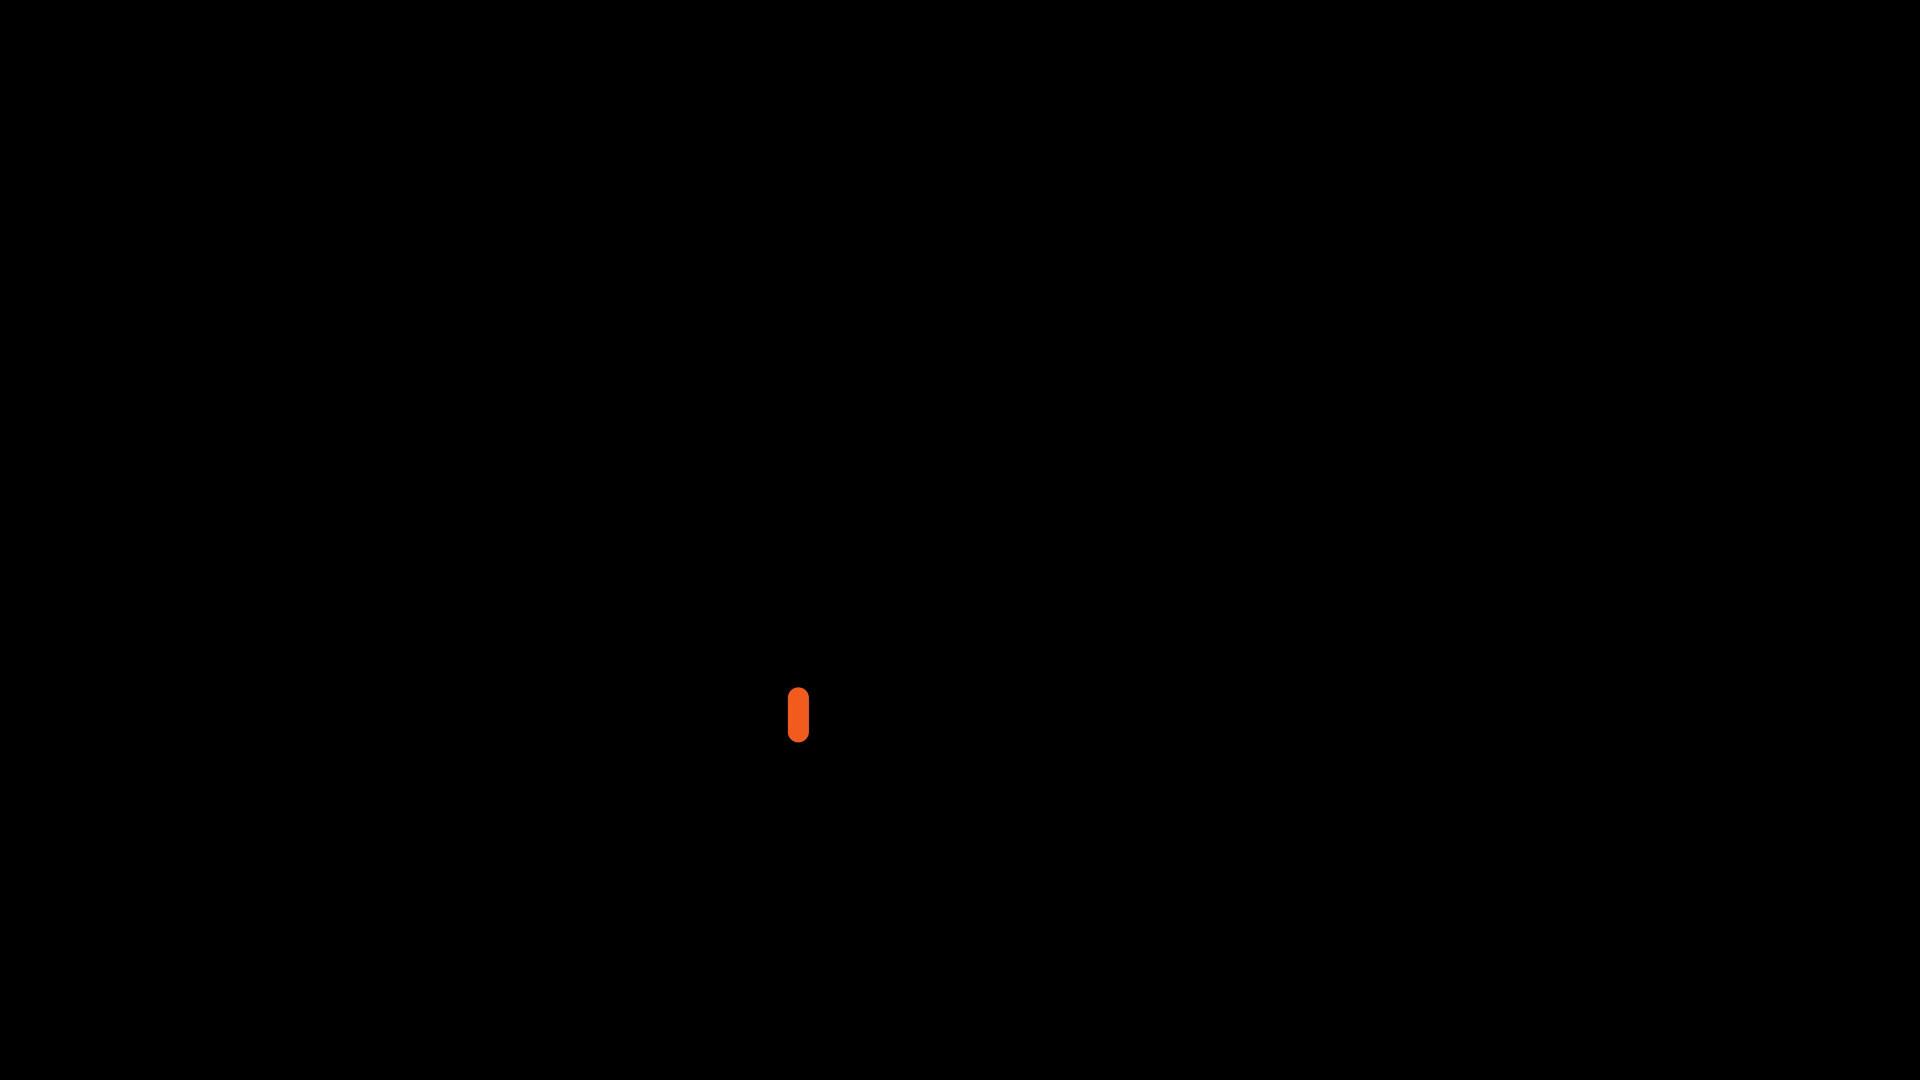 LOGO 4 Merdivenli REV 2_2.mp4